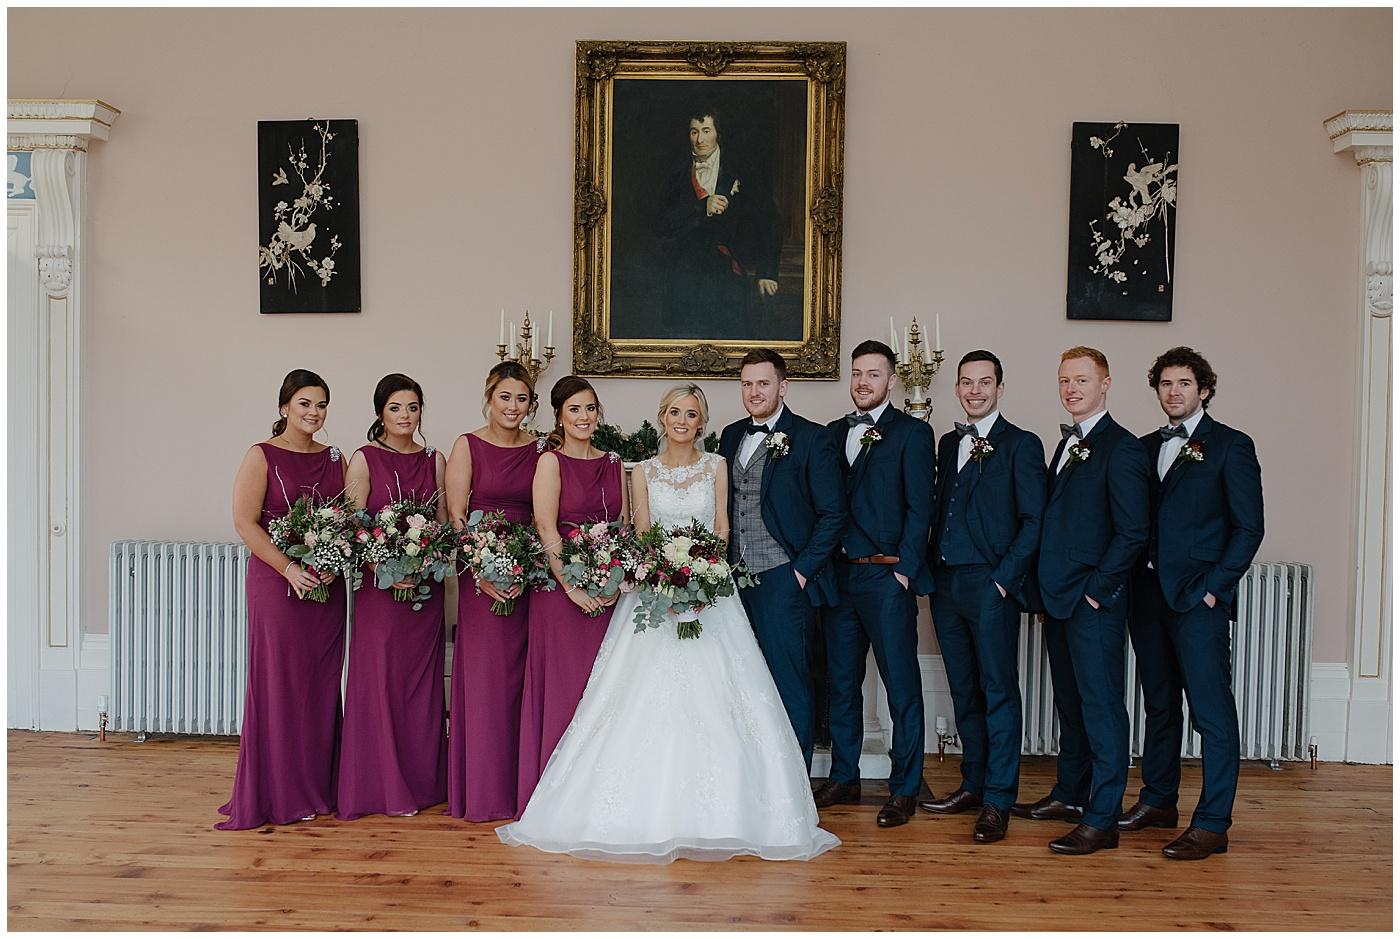 lissan-house-wedding-jude-browne-photography_0058.jpg